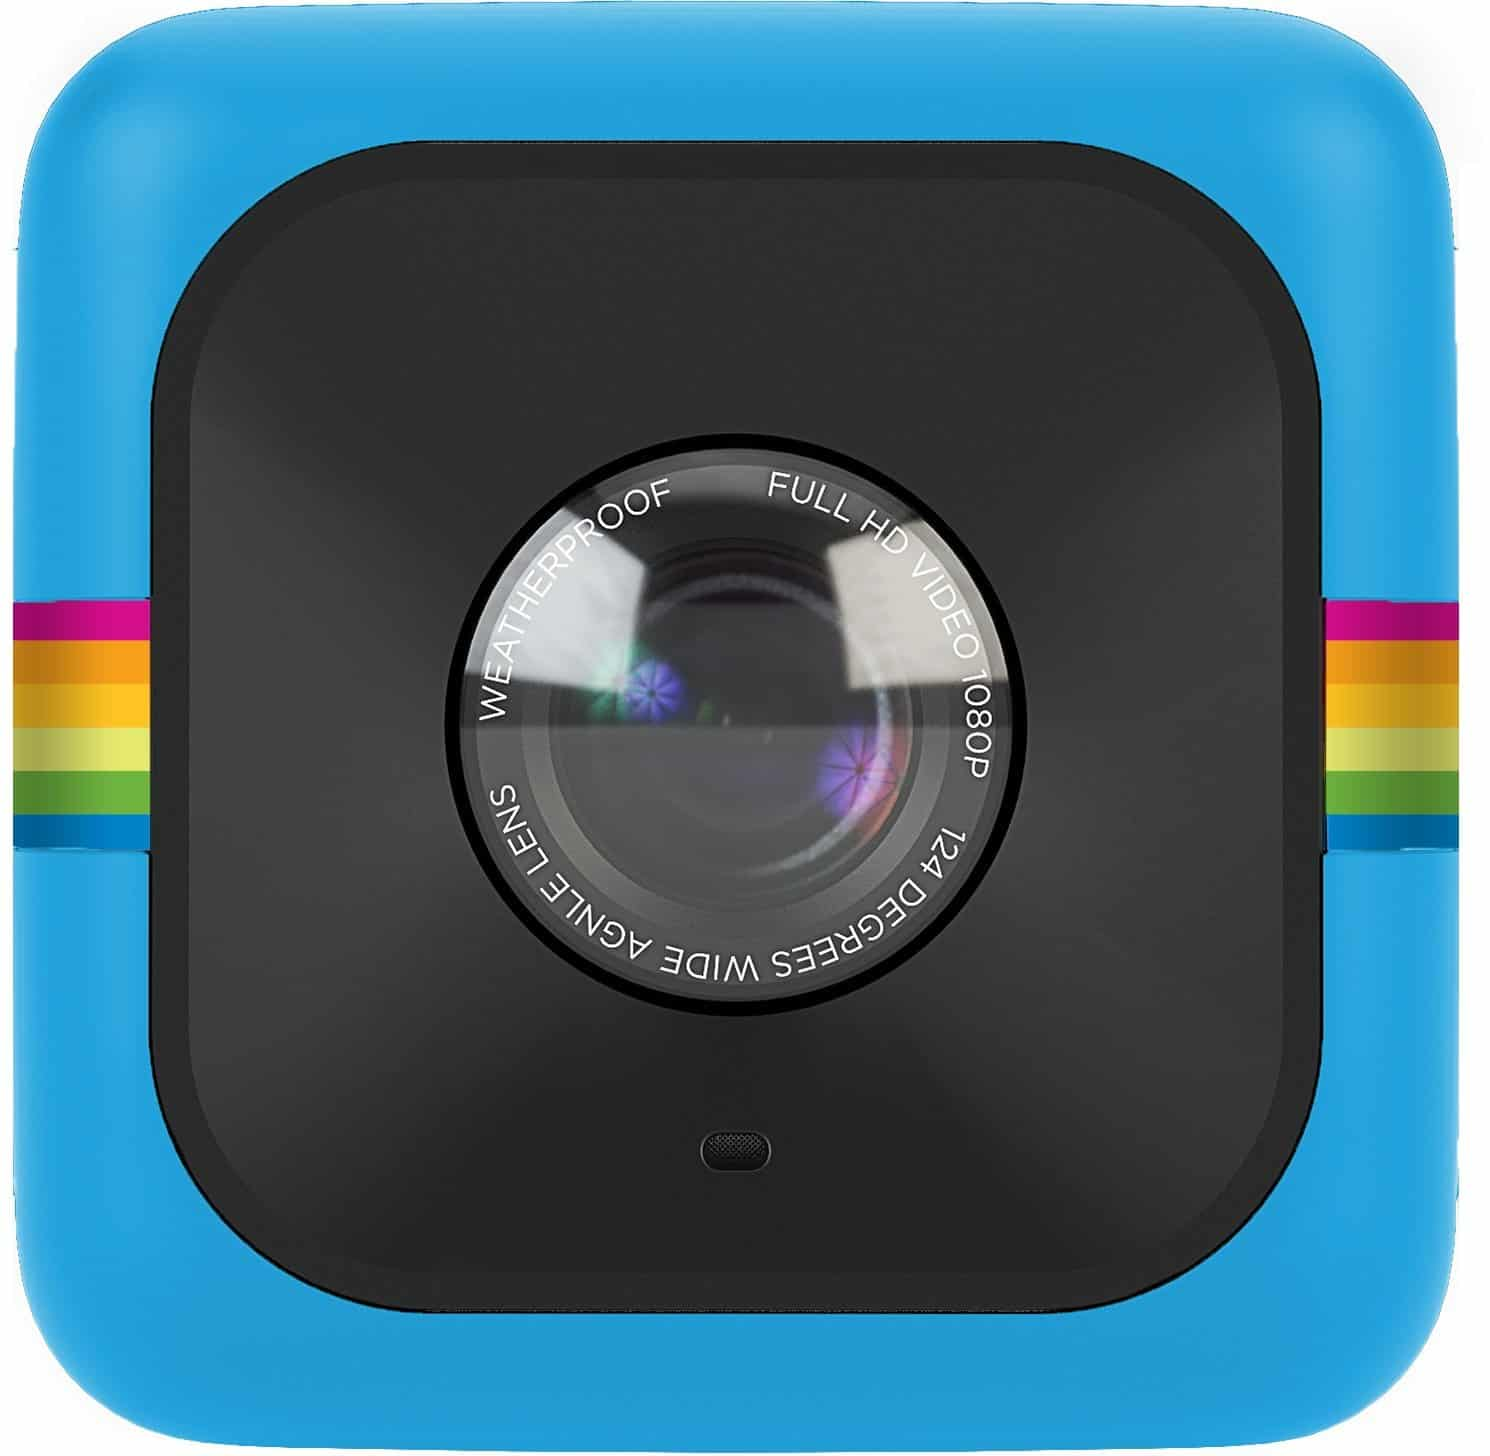 Polaroid POLC3 Cube Lifestyle Action Camera Buy Small HD Camera